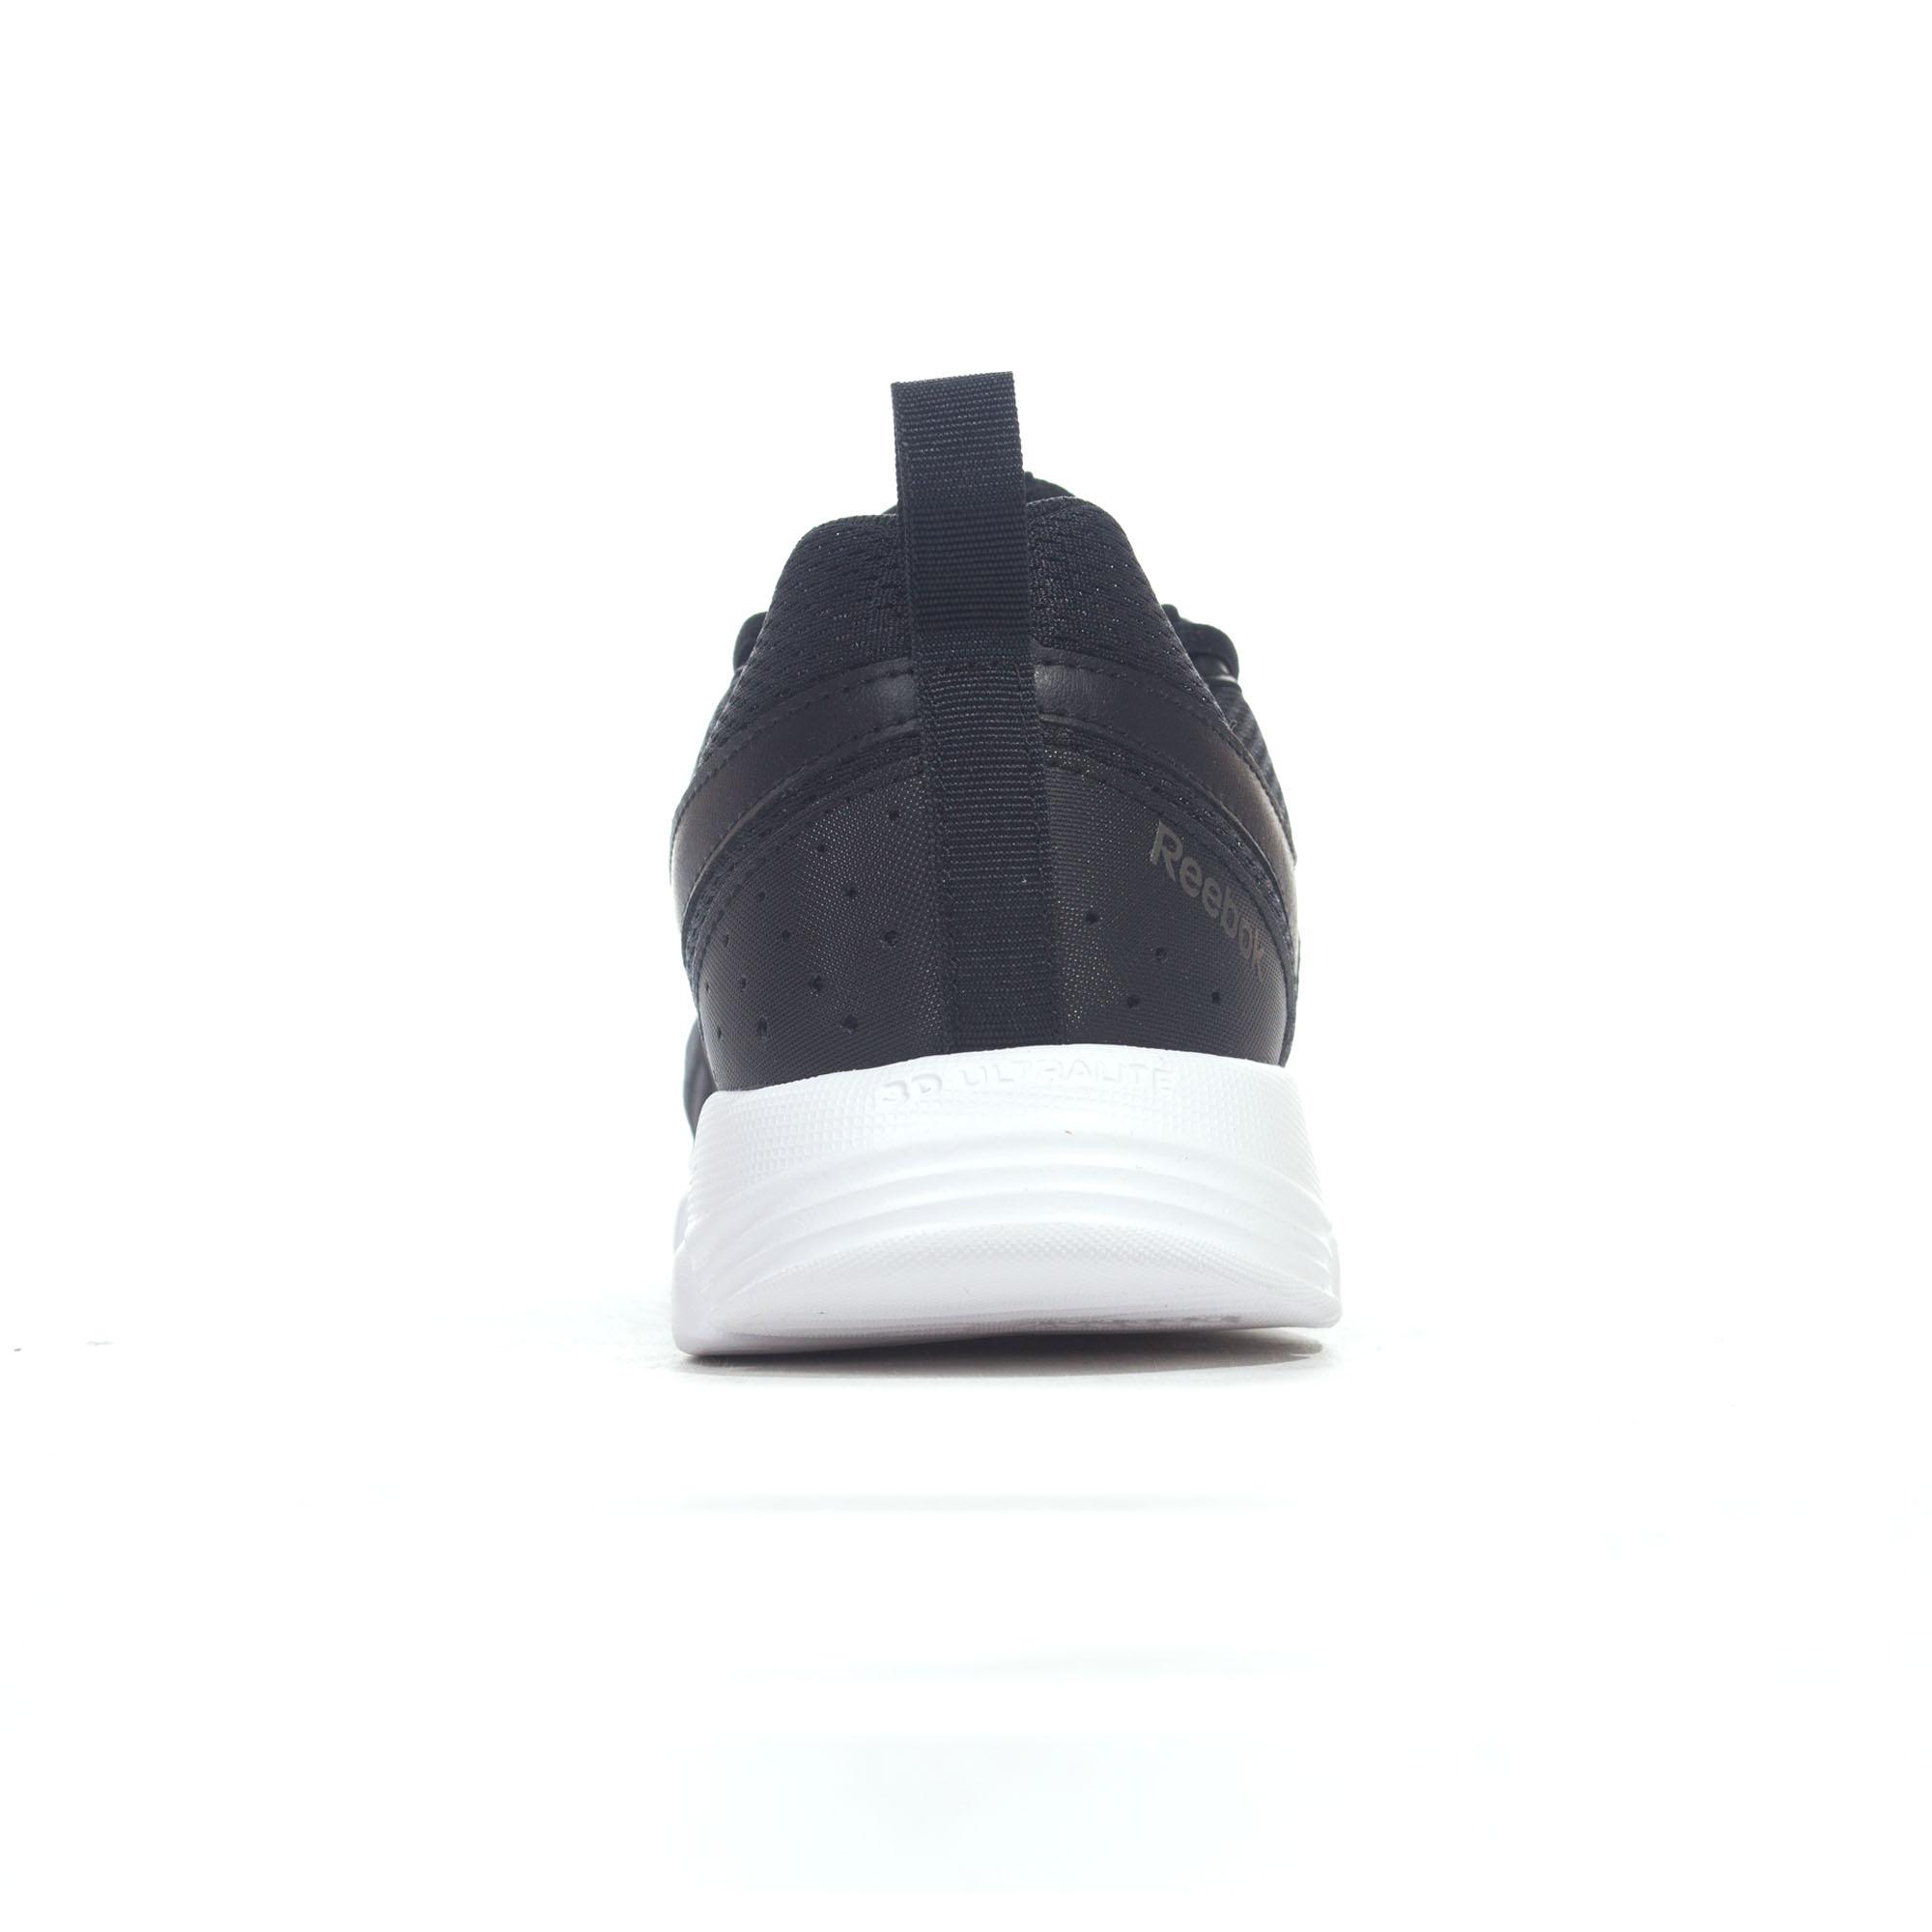 97c11bd013e Reebok 3D Fusion TR Mens Training Fitness Trainer Shoe Black